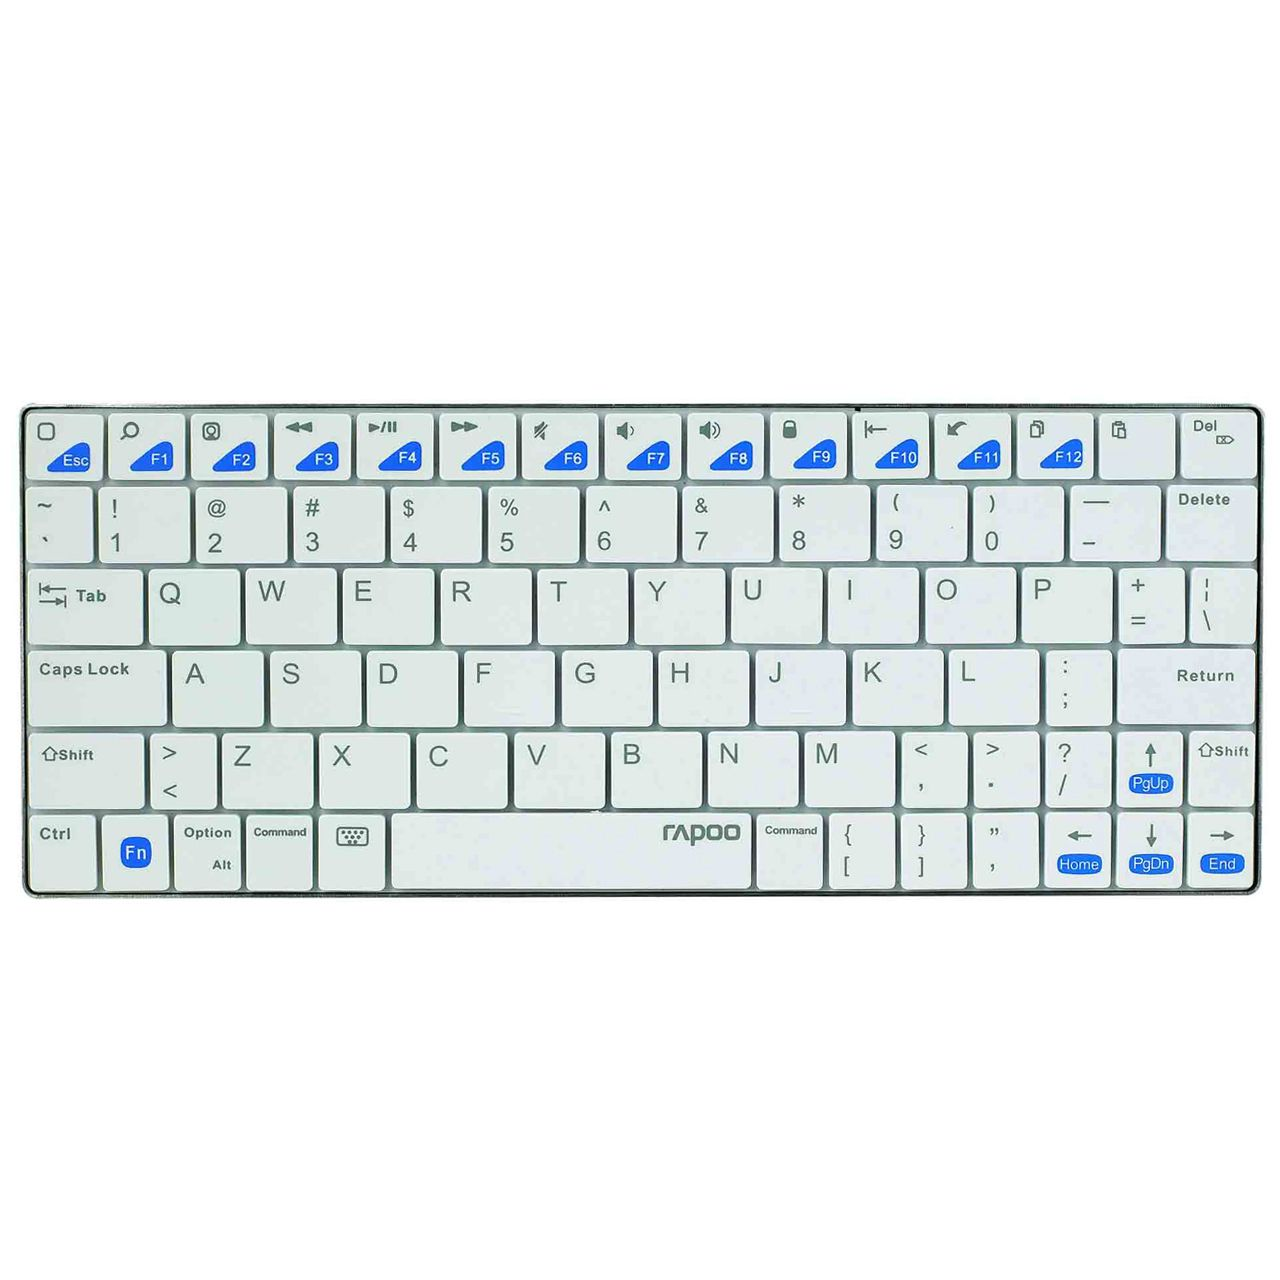 Rapoo-tablet-keyboard-e6300-toetsenbord-erkaestz01_0000_wit